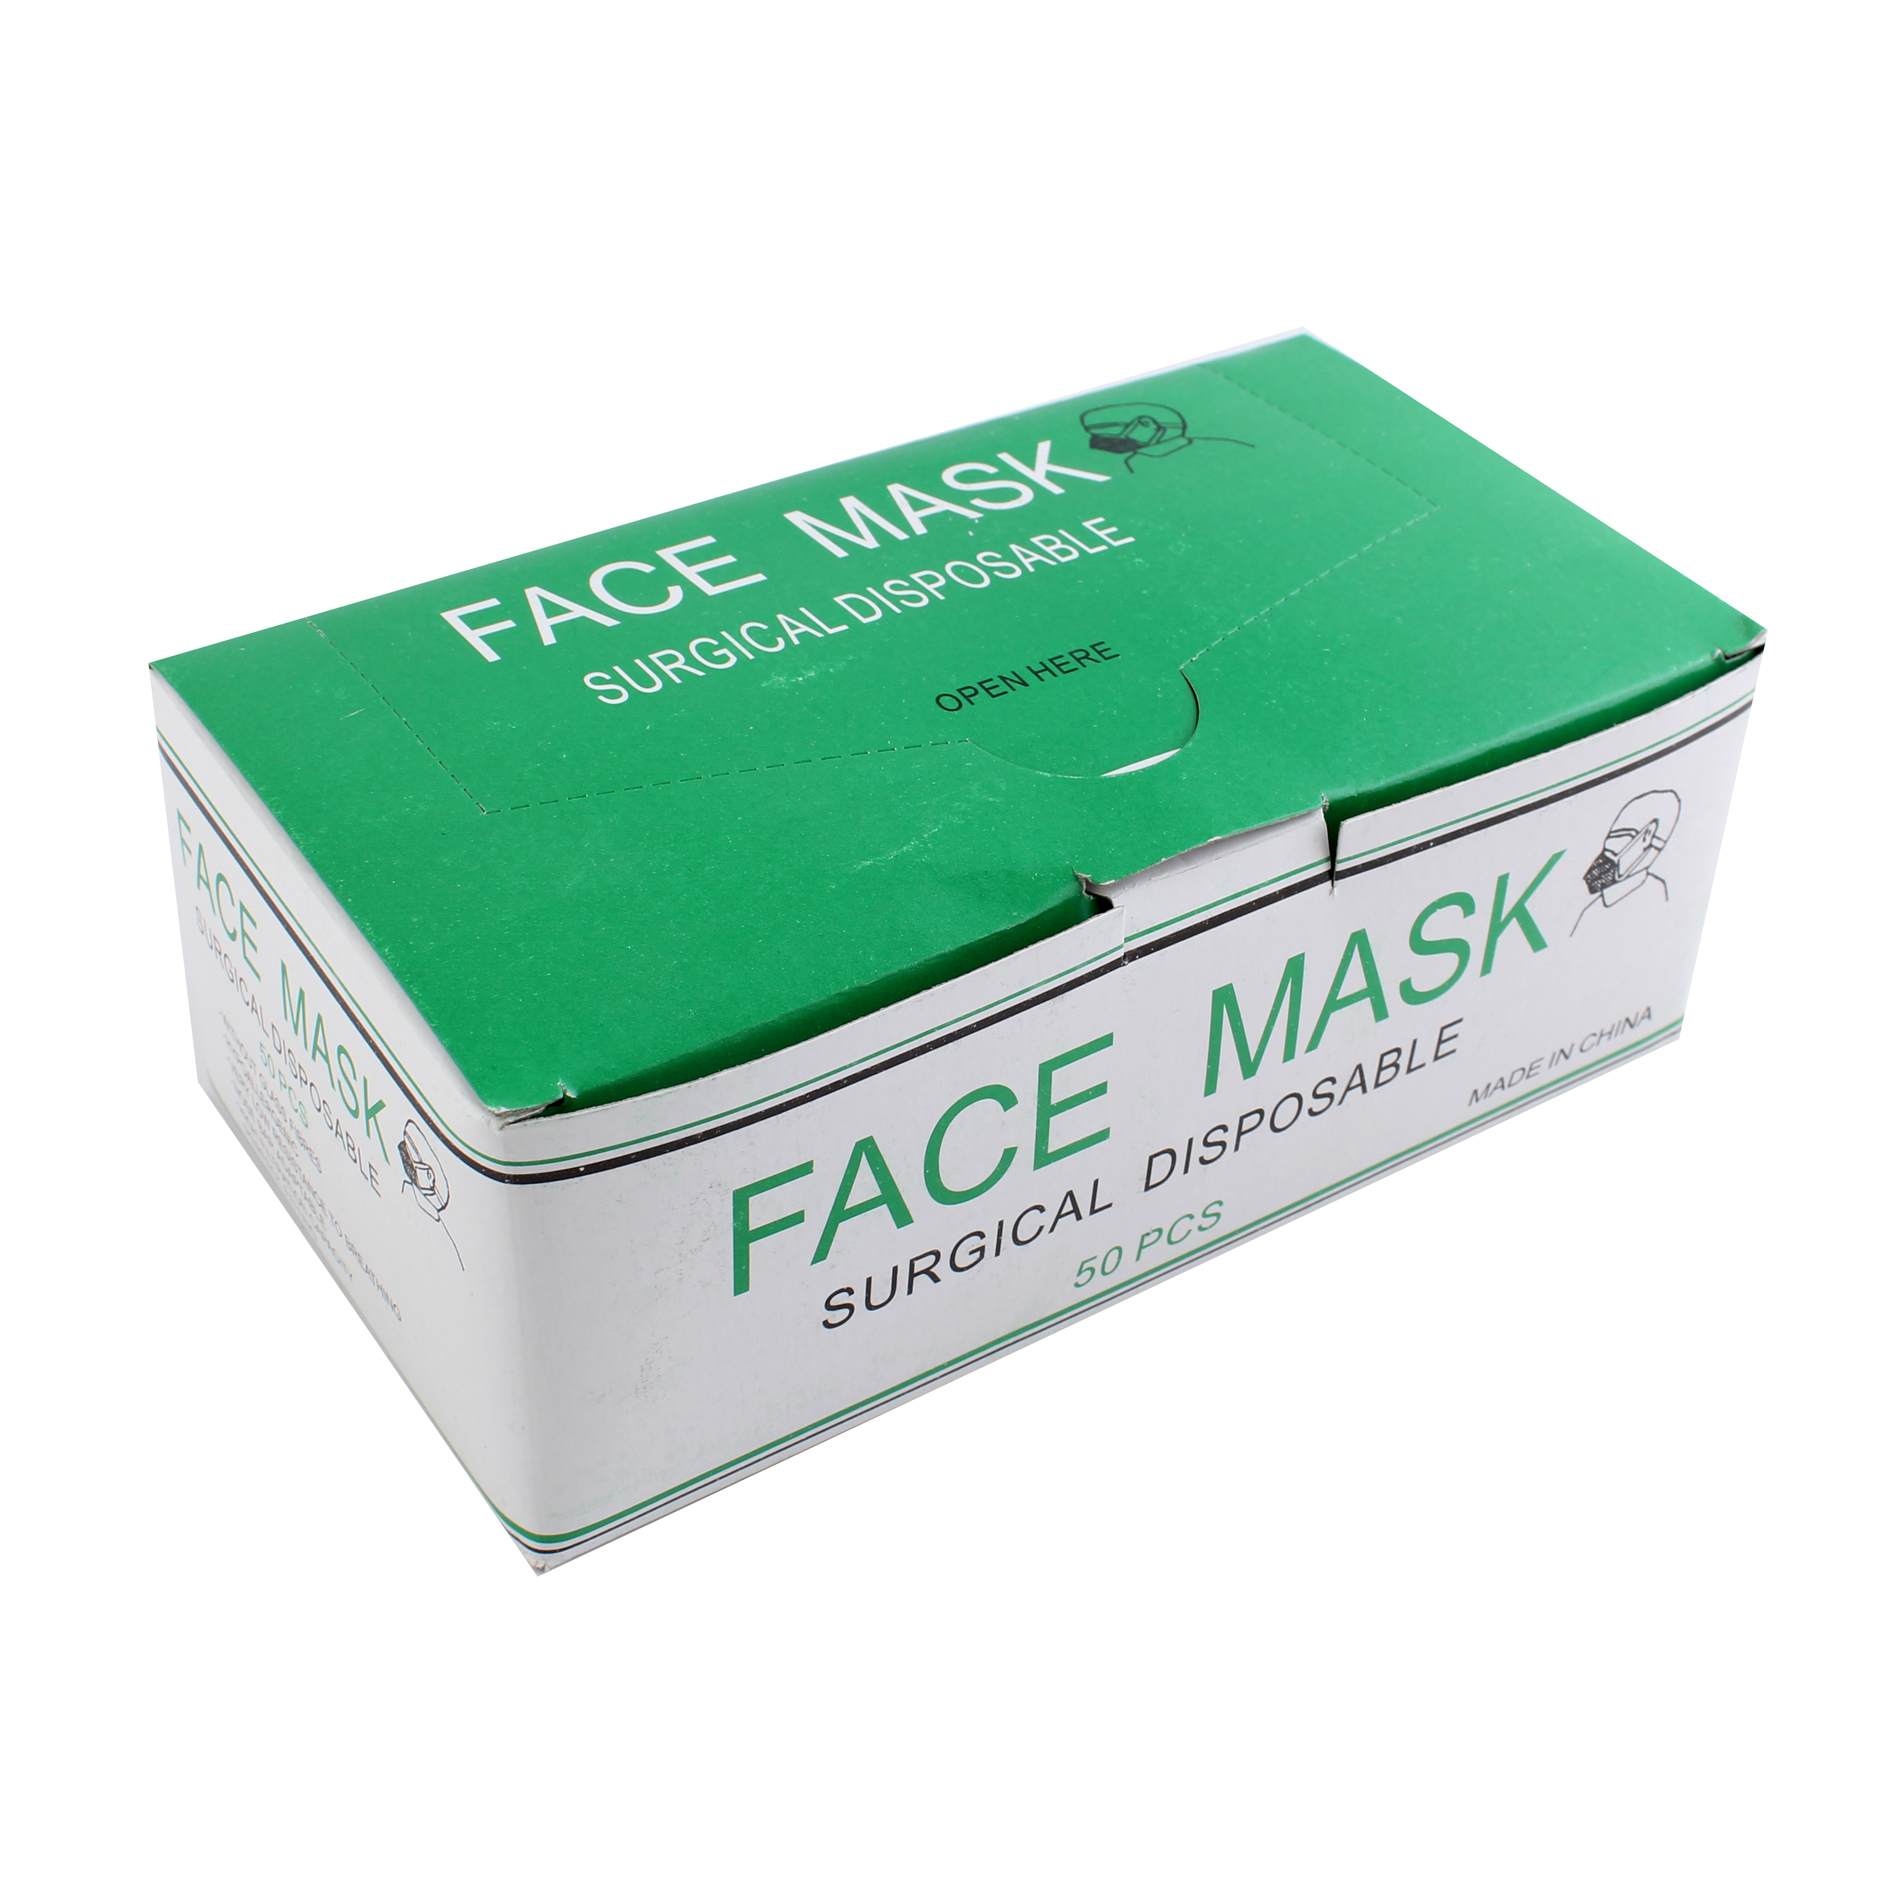 Dust Dental Surgical Salon Masks 50 Face Blue Disposable Details Mask Medical About